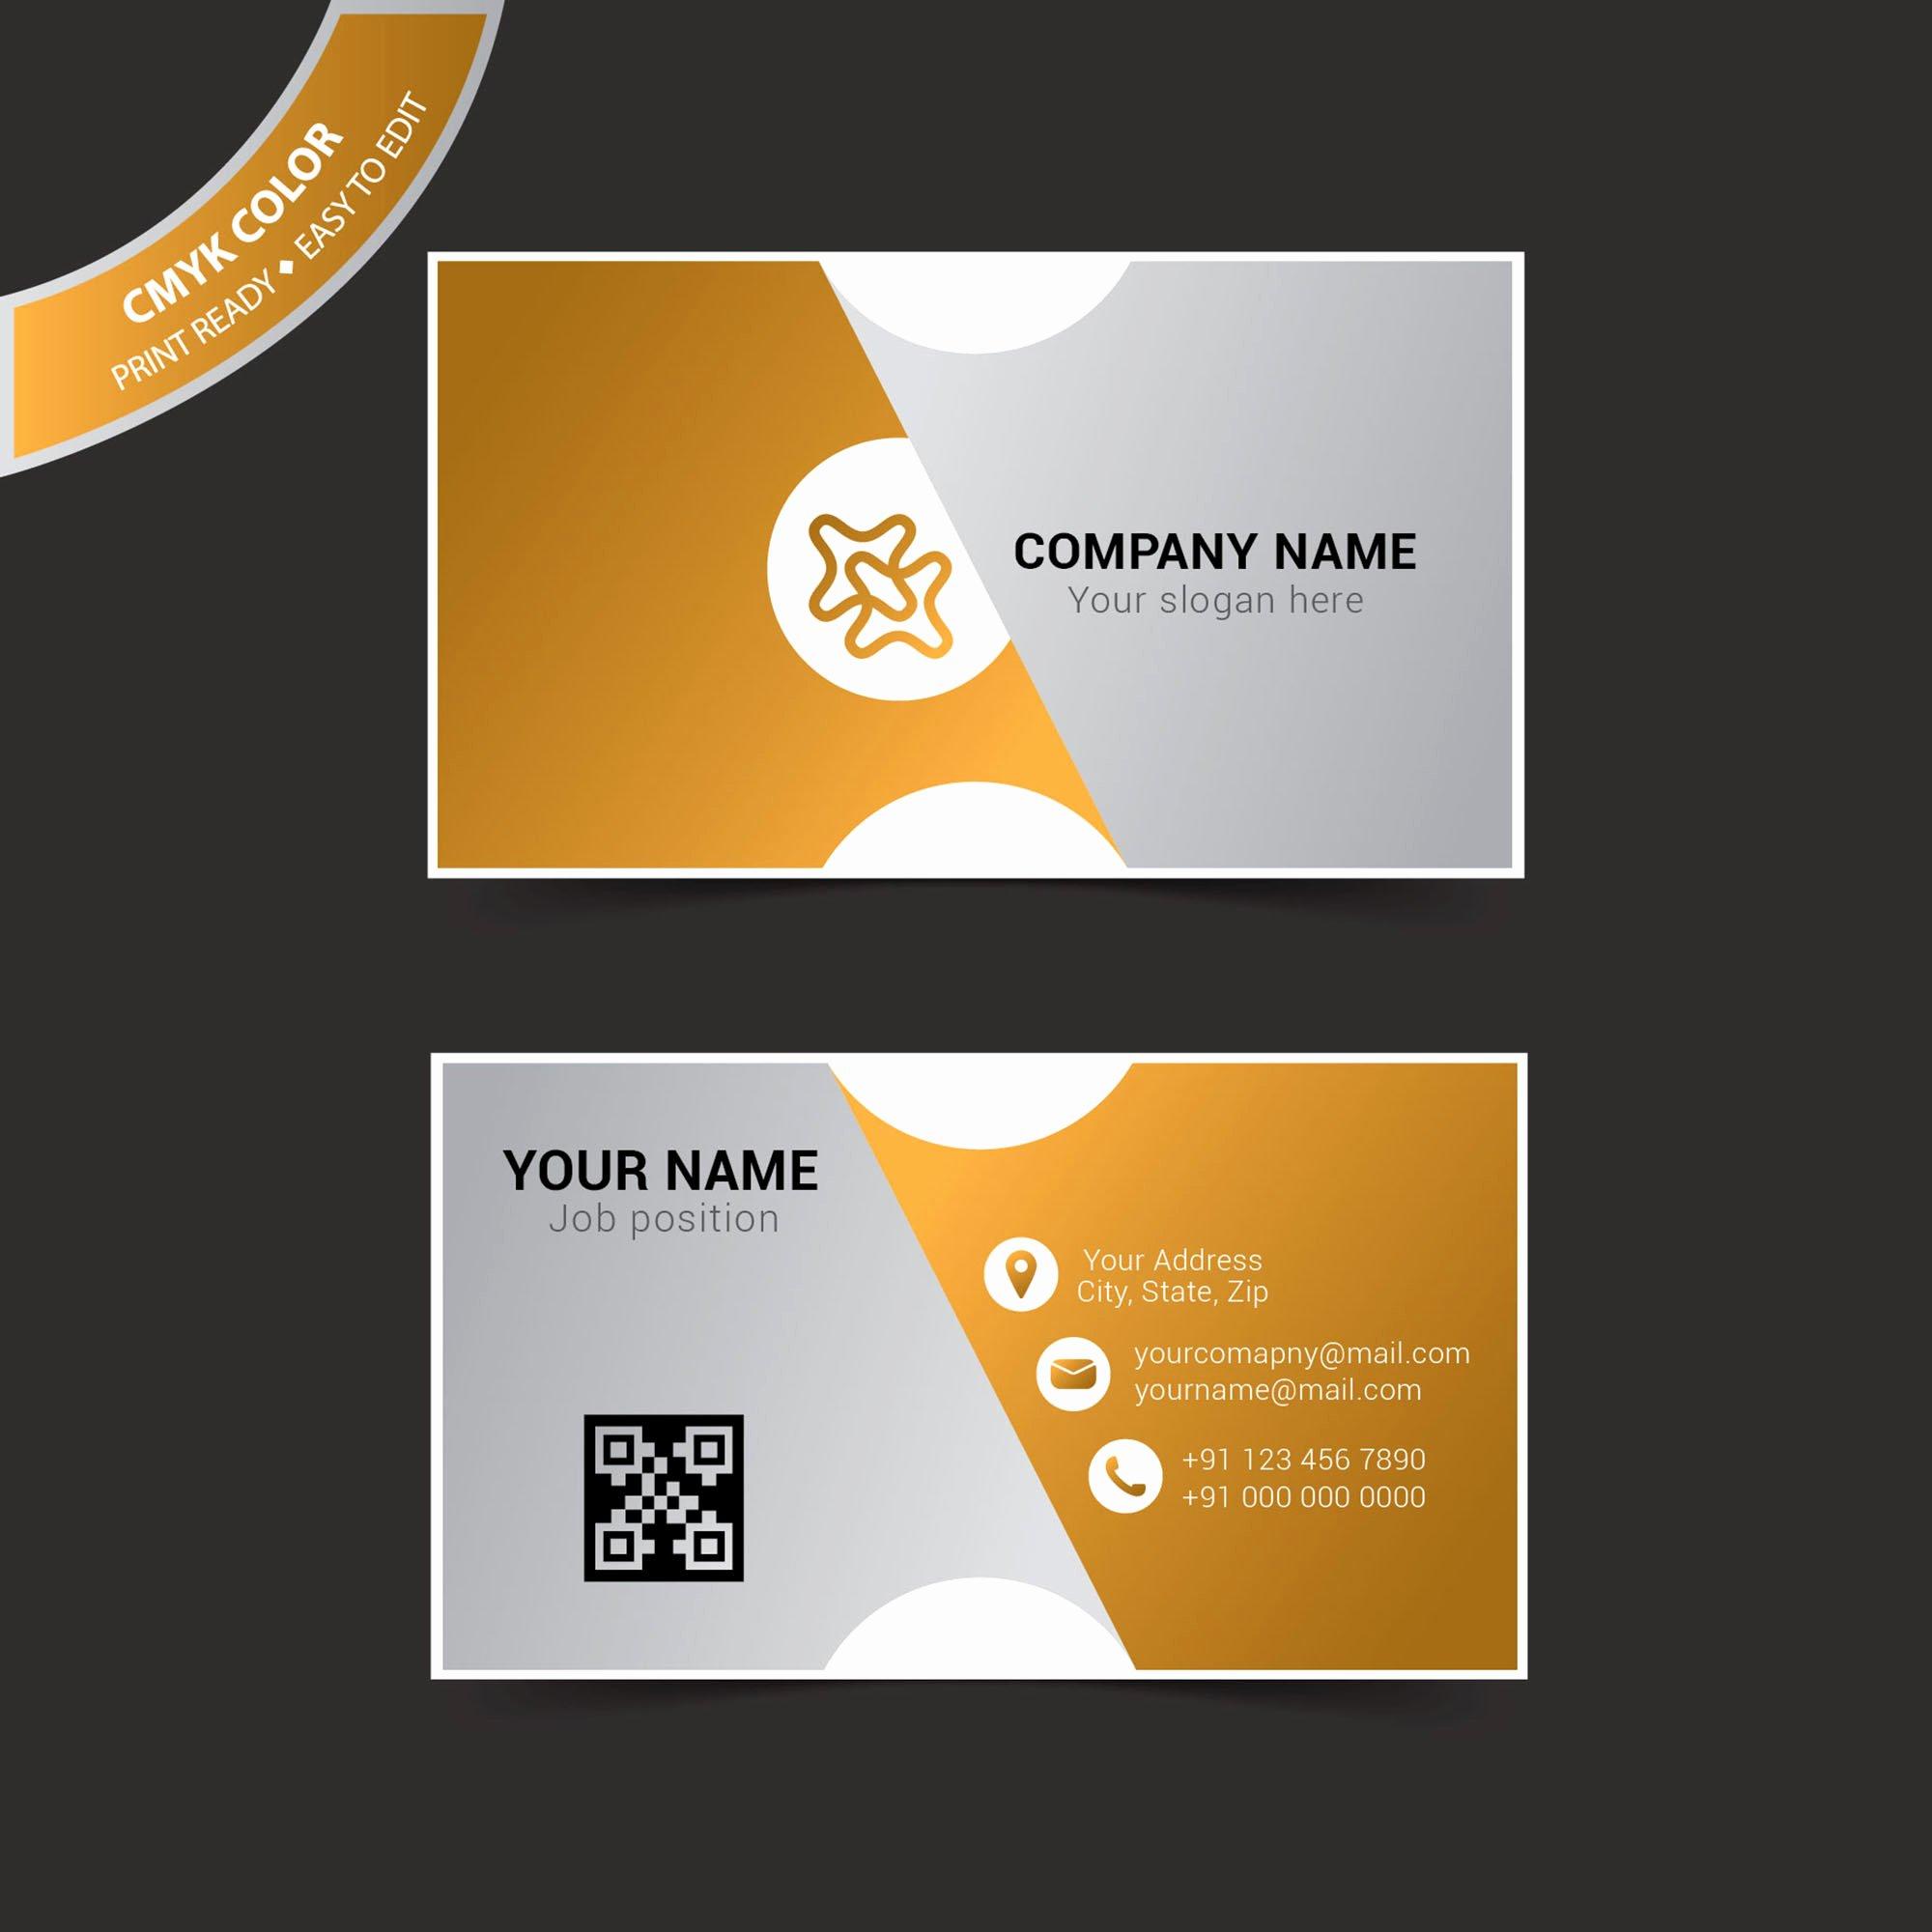 Business Card Template Illustrator Fresh Business Card Template Illustrator Free Vector Wisxi